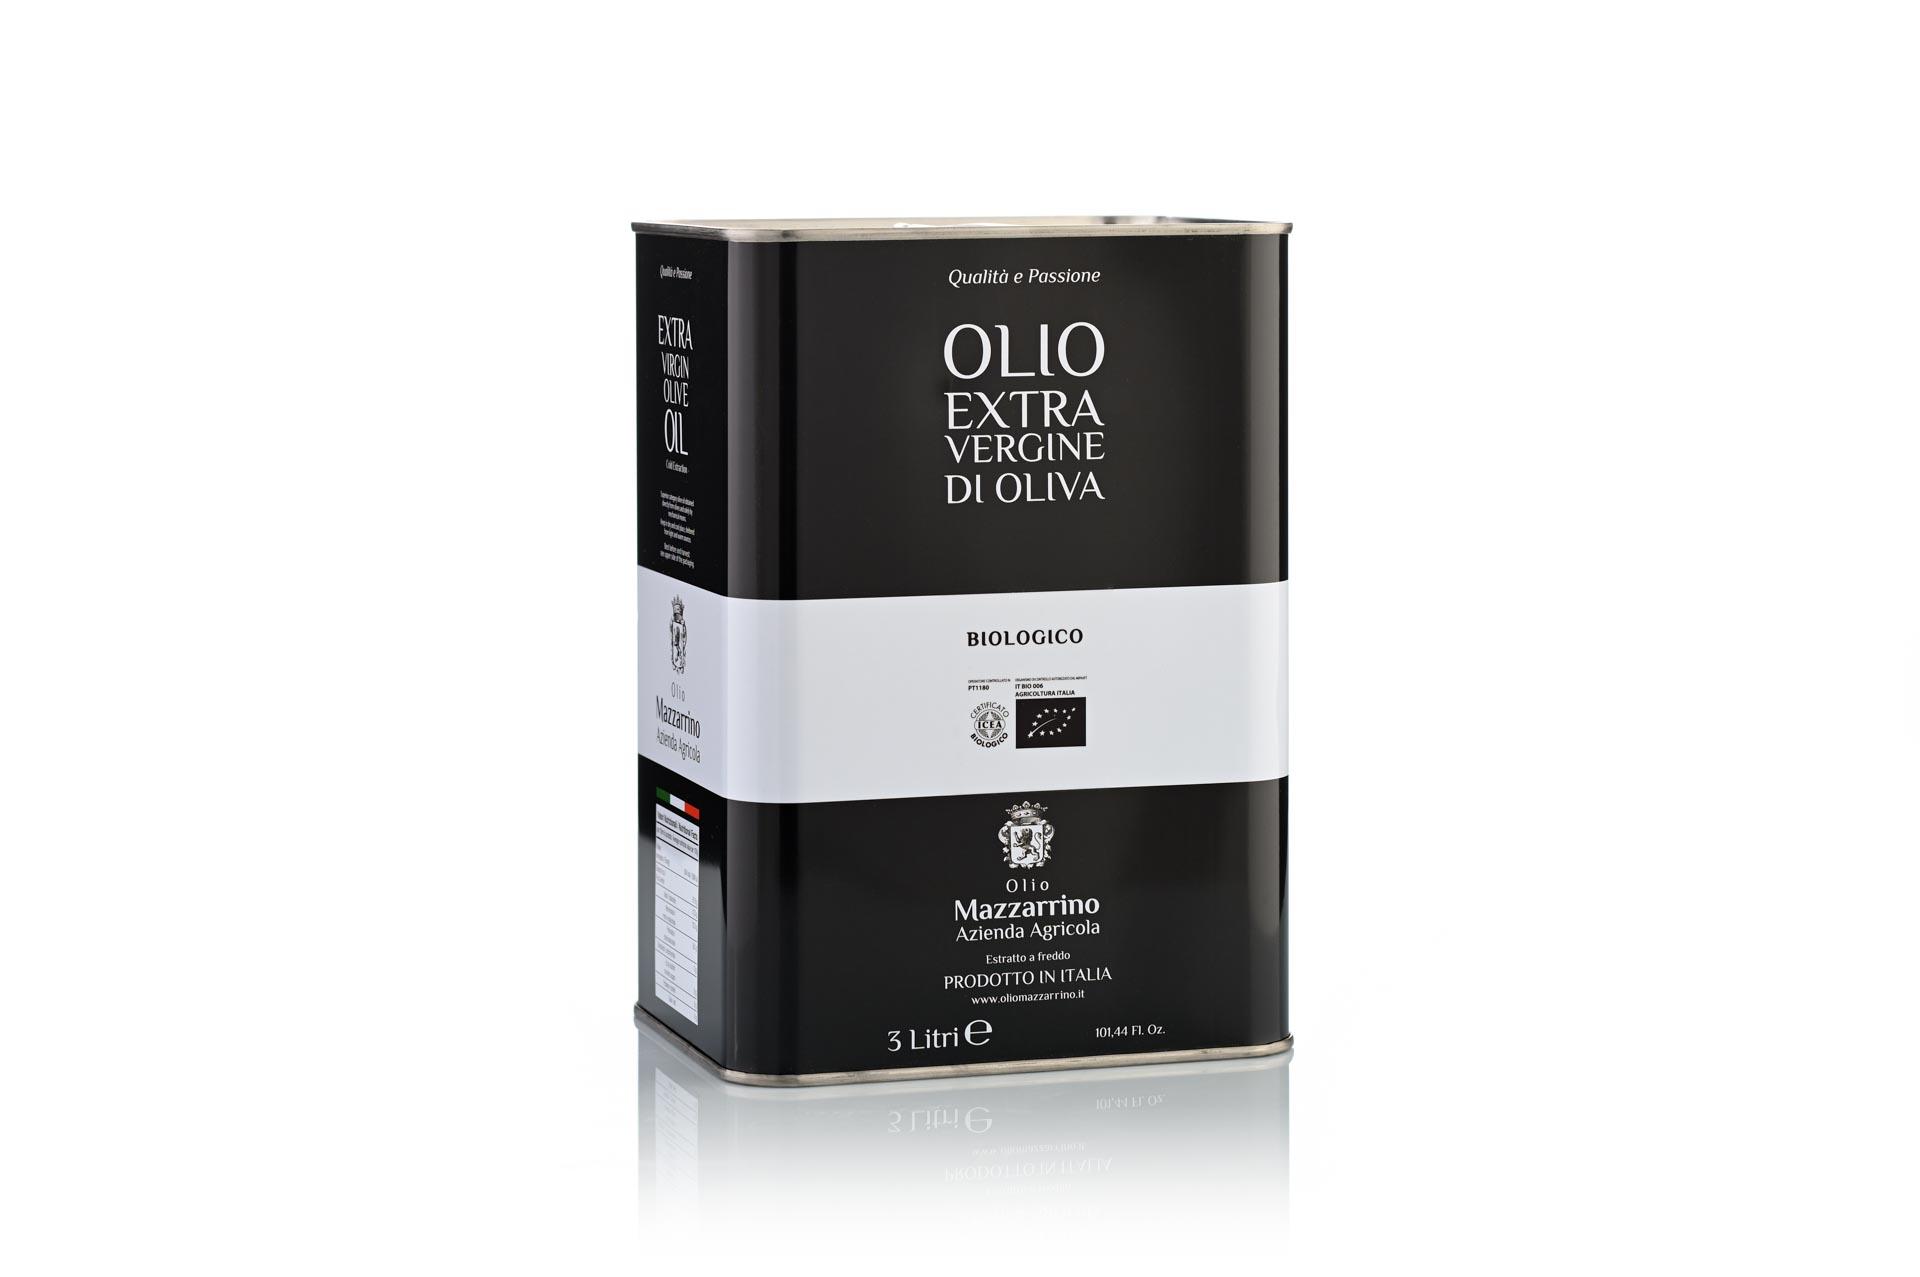 Olio extravergine di oliva Biologico – 4 lattine da 3 litri